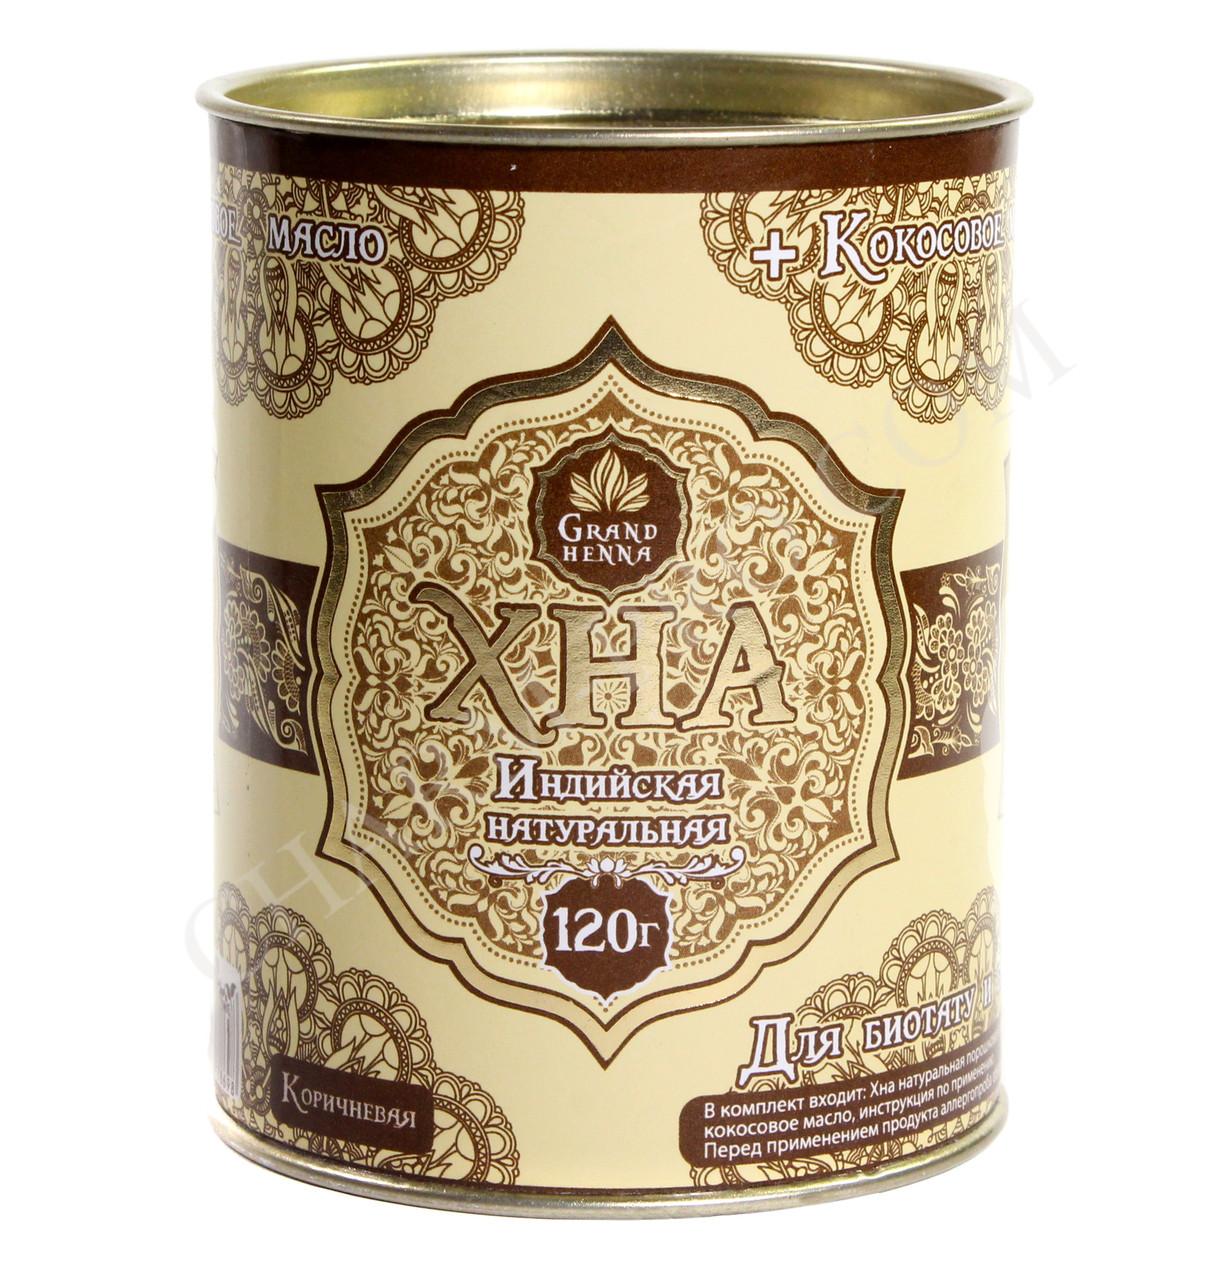 Grand Henna (Viva) Хна для Биотату и Бровей, коричневая 120 г.